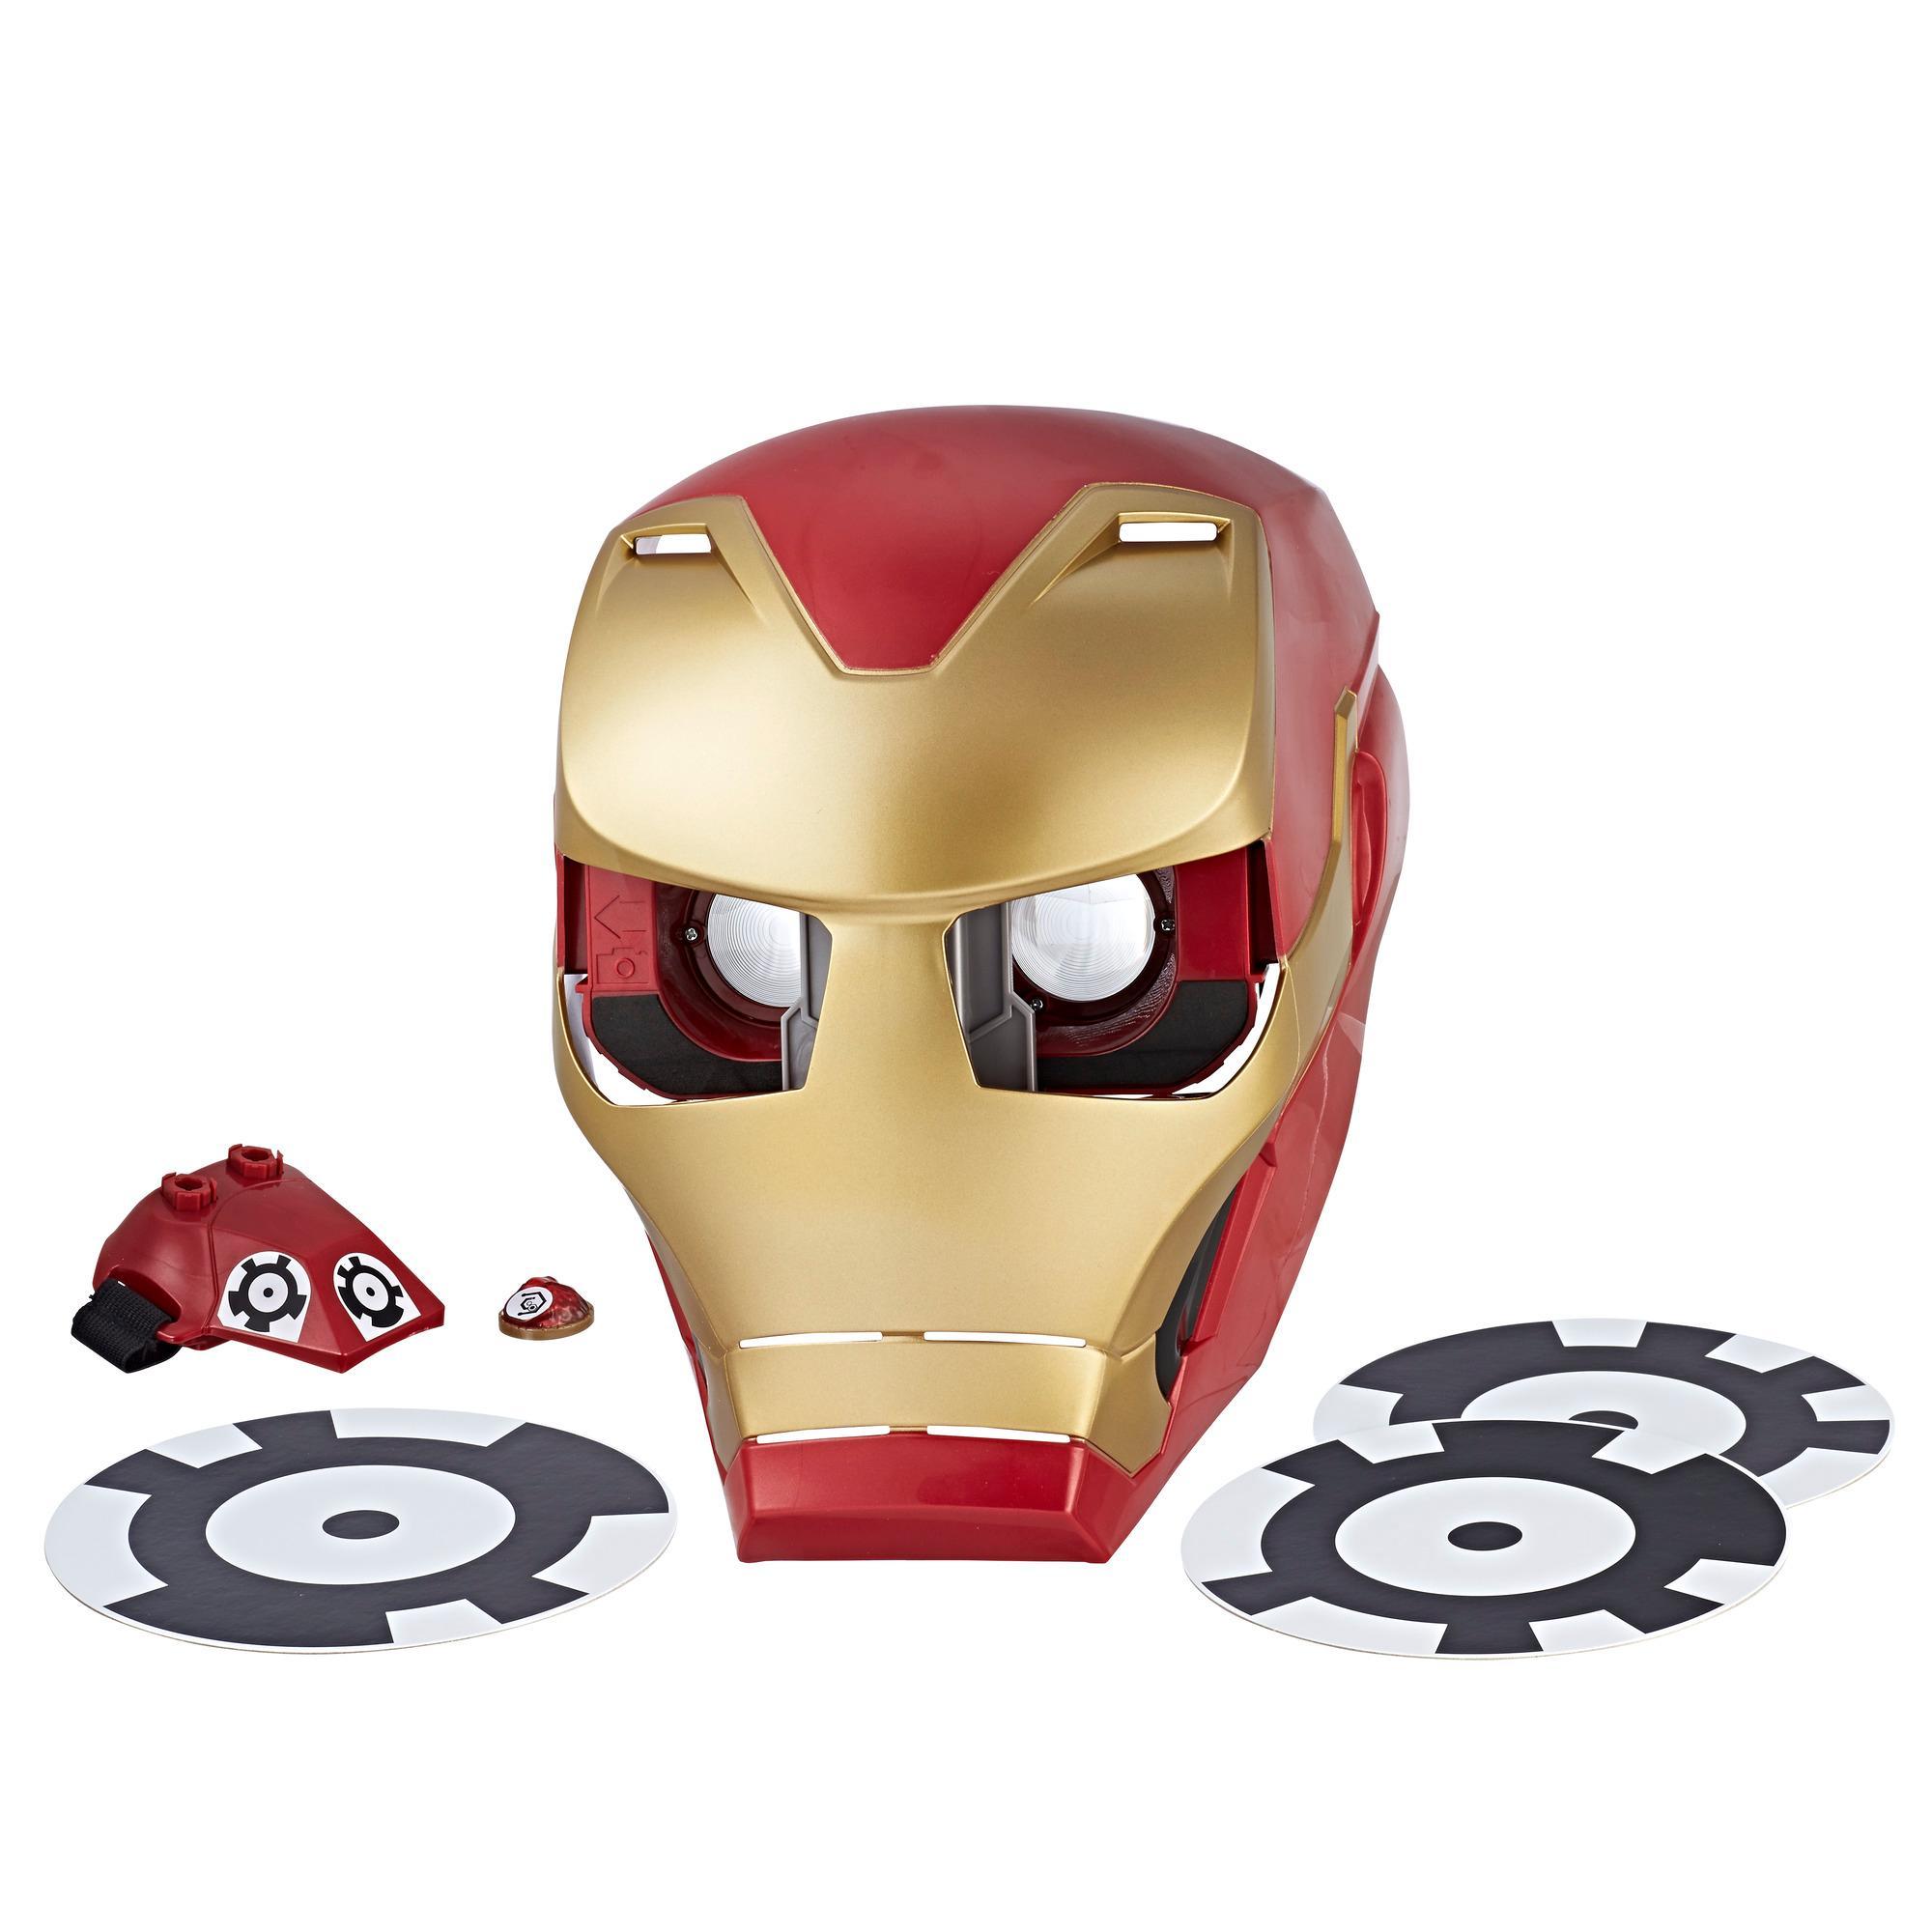 Marvel Avengers: Infinity War Hero Vision Iron Man AR Experience